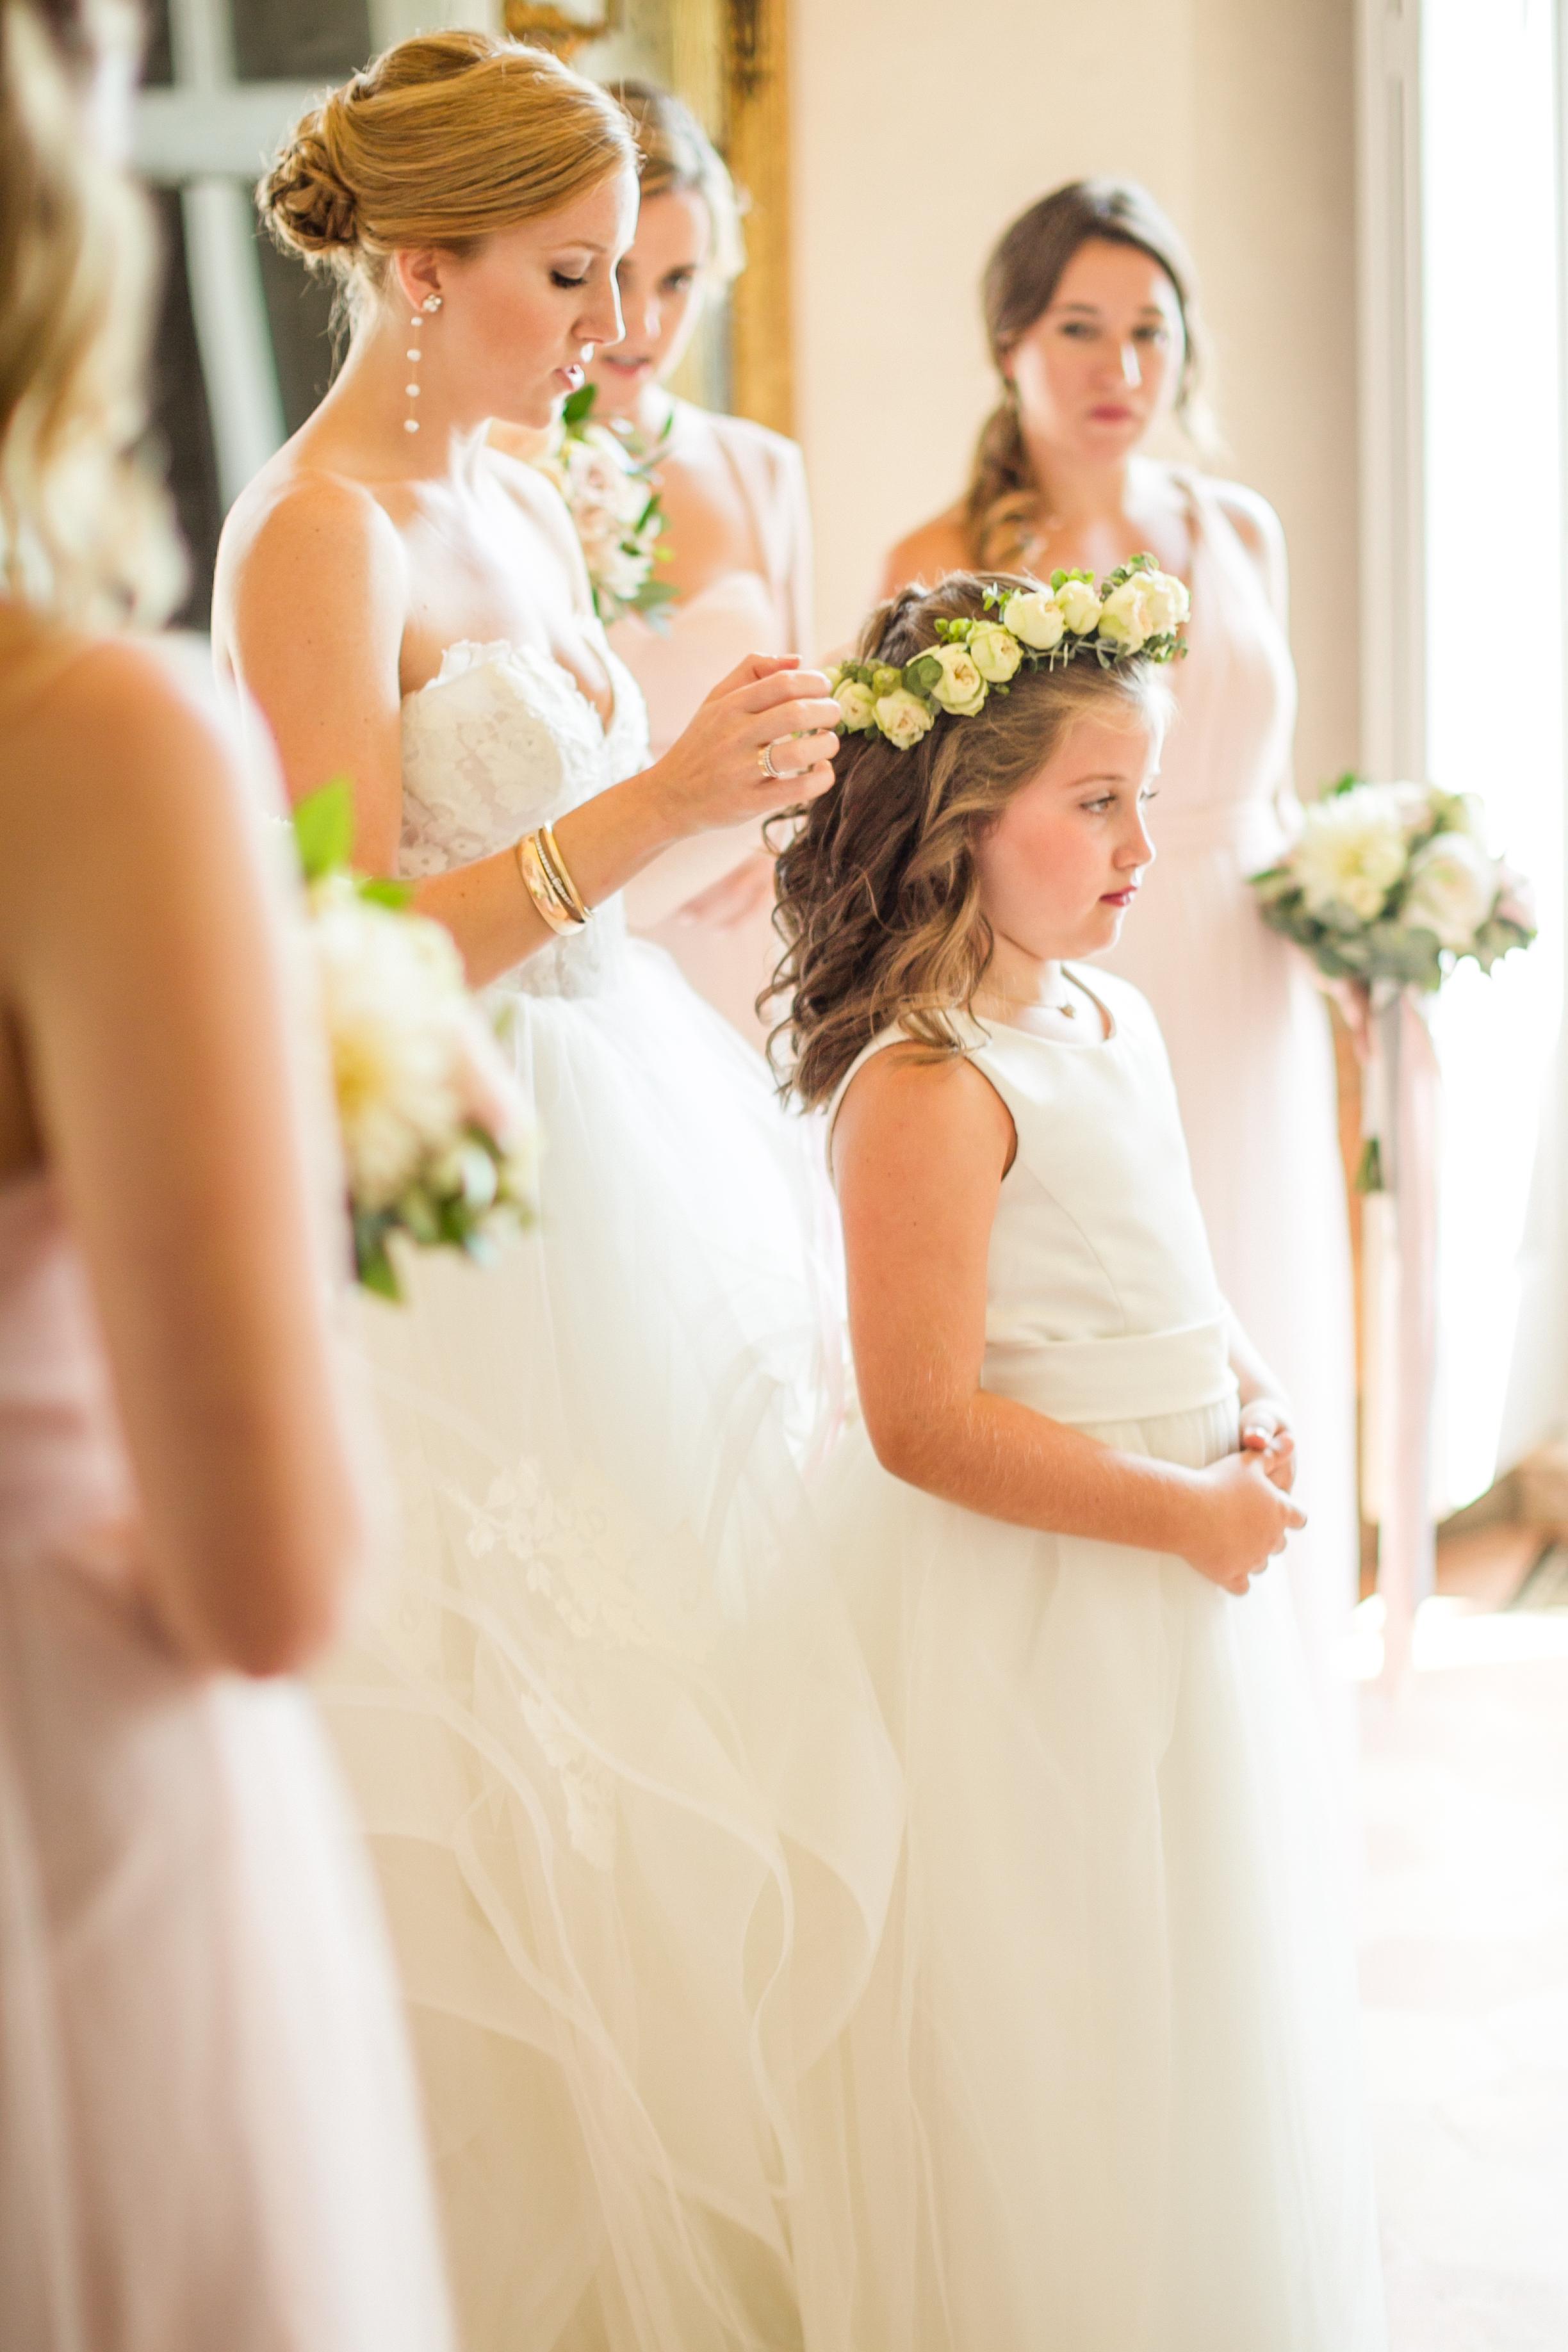 04_bridesmaids-0406.jpg